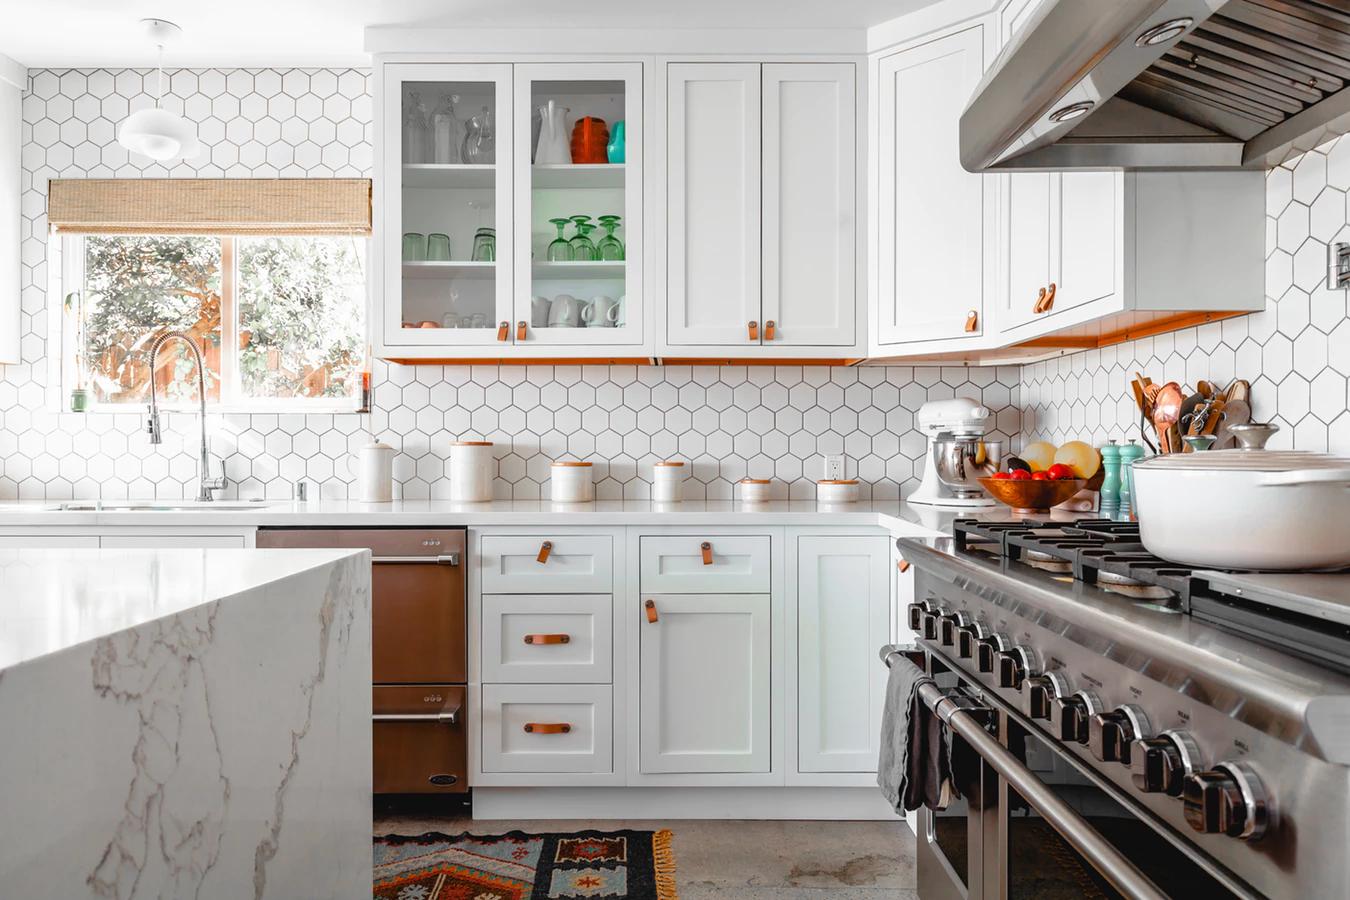 A modern kitchen colored bright white